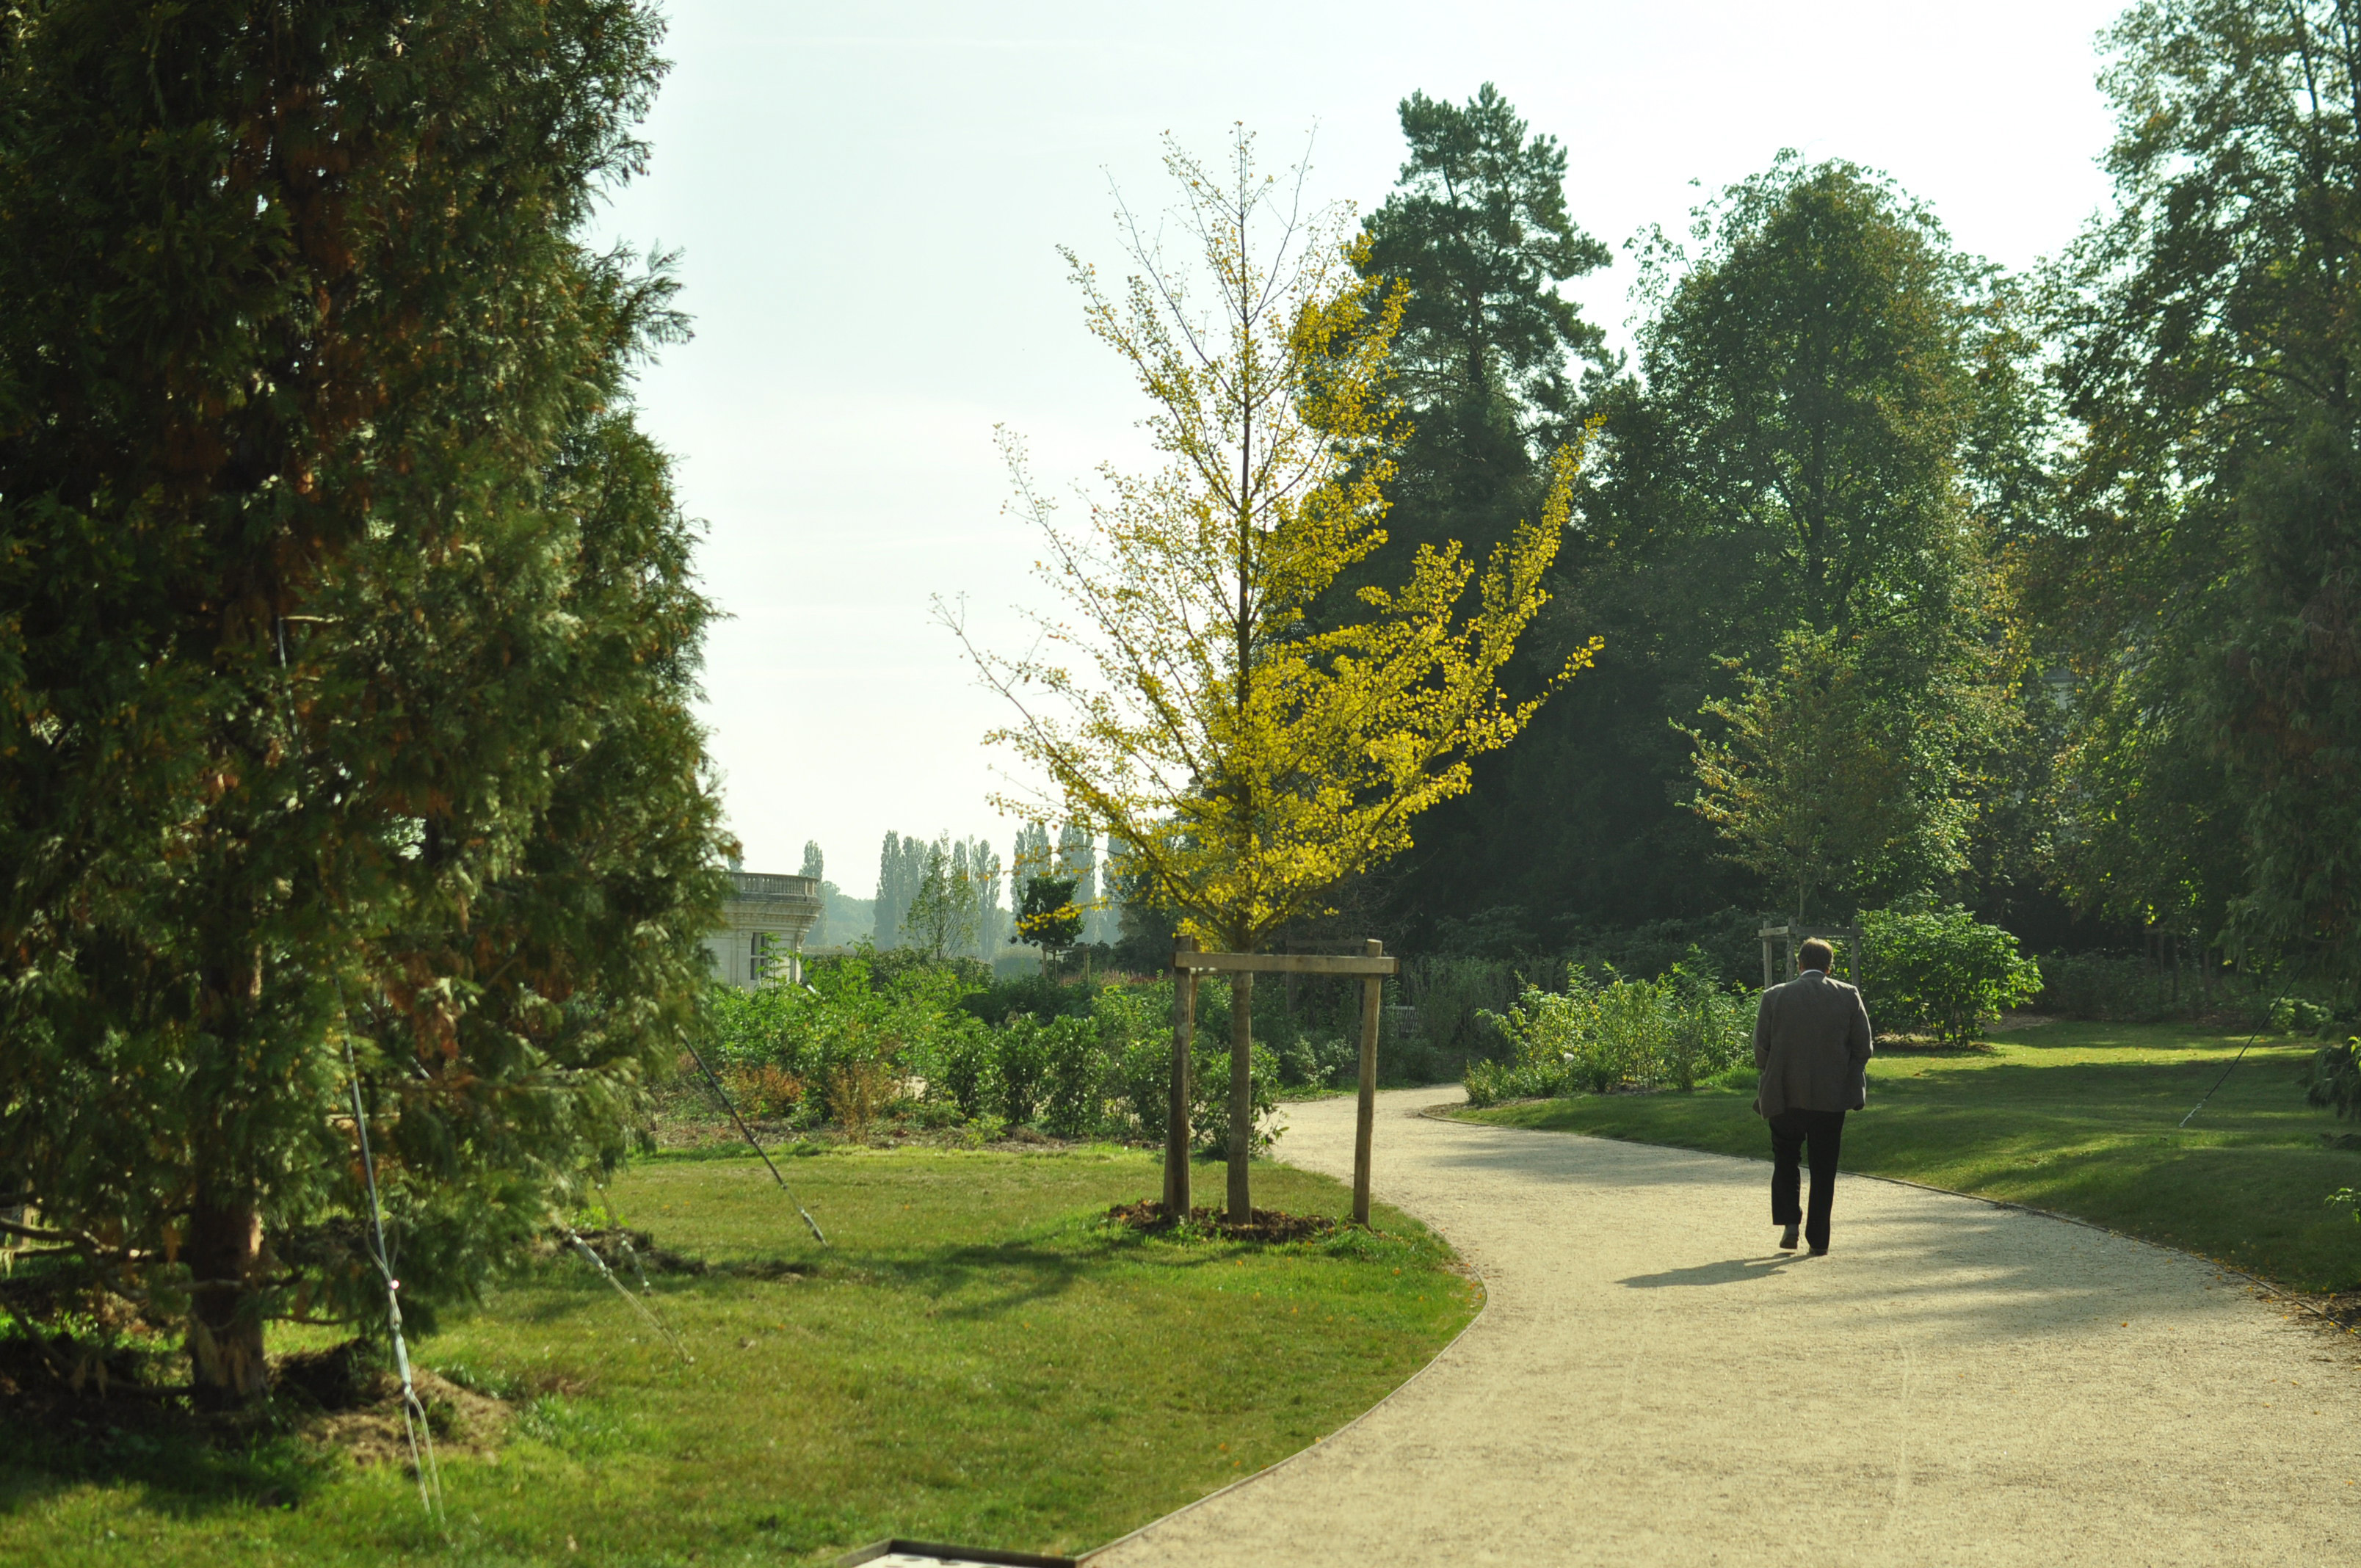 Jardin anglais chambord thierry jourd 39 heuil architecte for Jardin anglais vegetaux